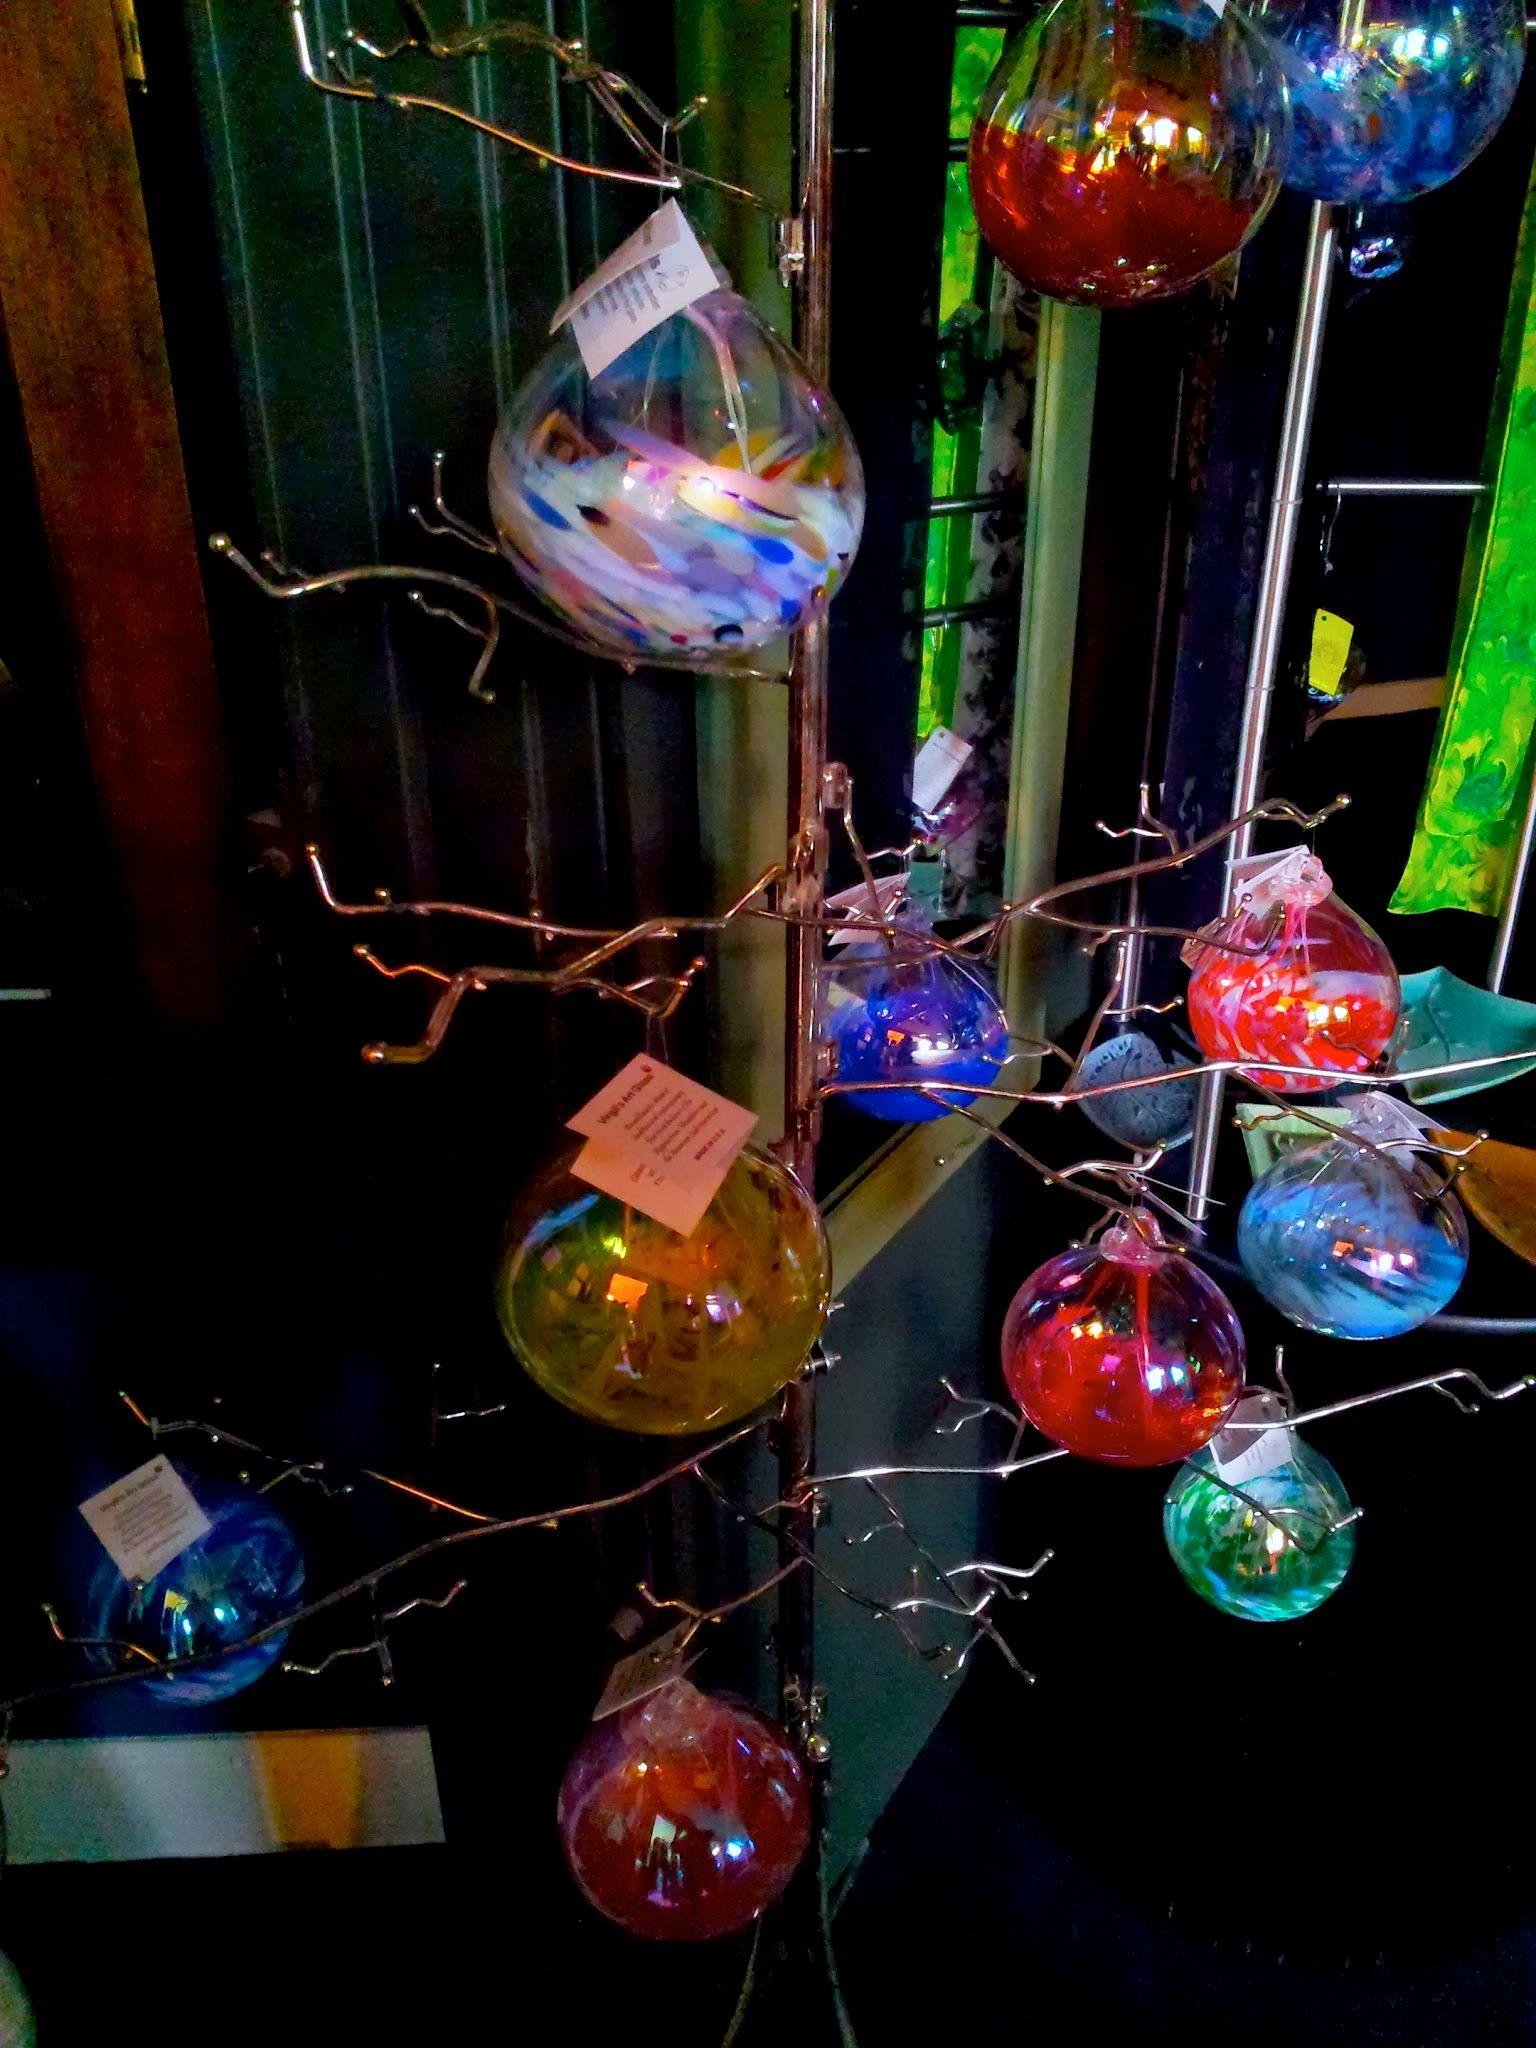 At Fiddlehead at Four Corners: blown-glass ornaments